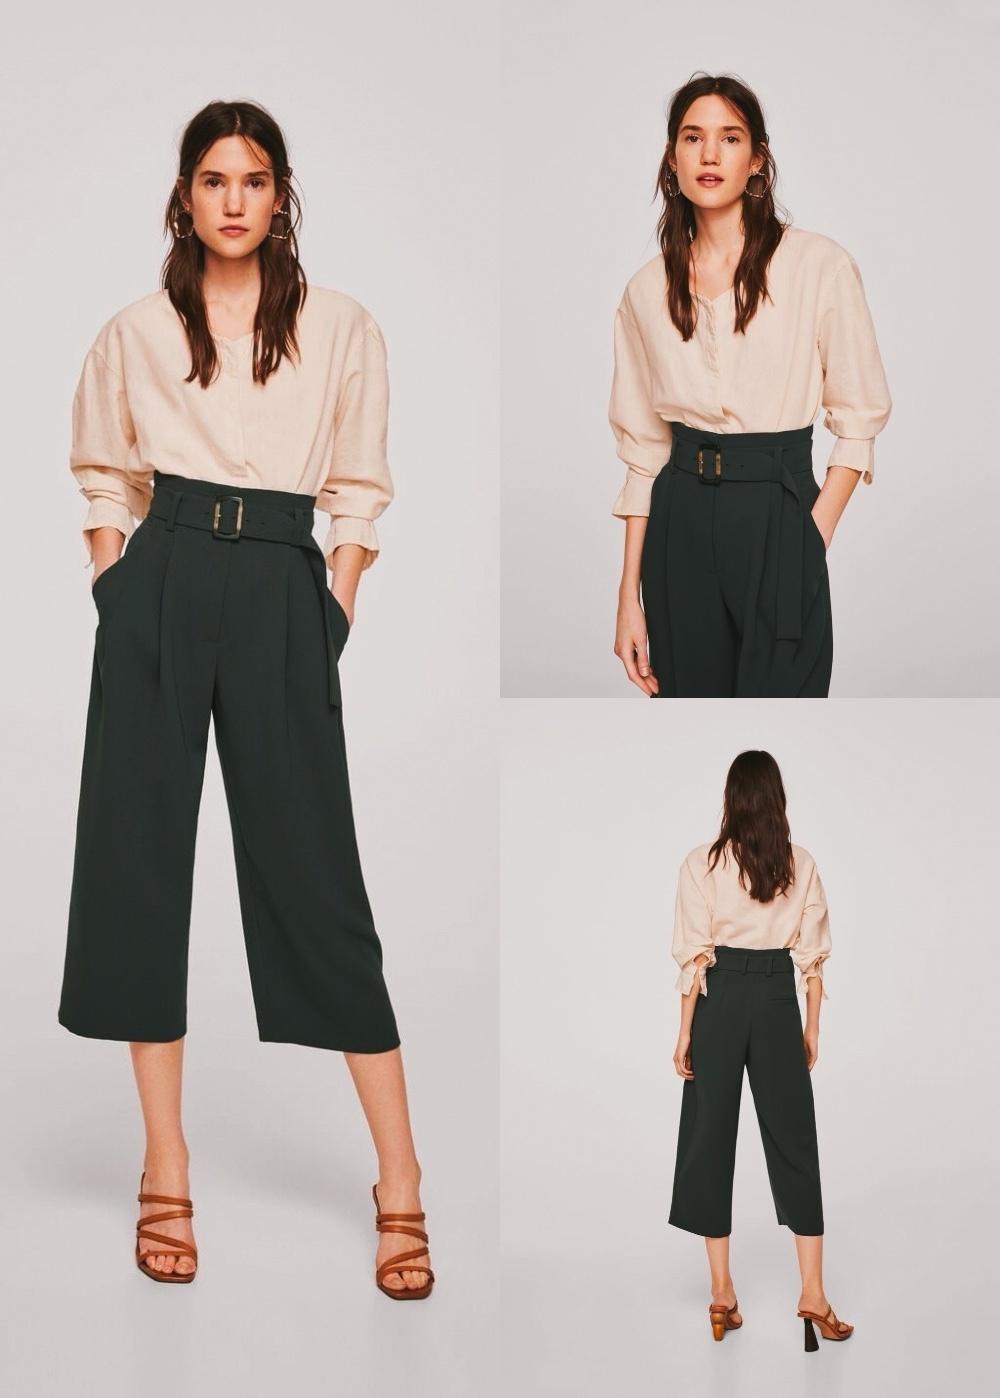 Джемпер Zara, брюки Mango 42/44